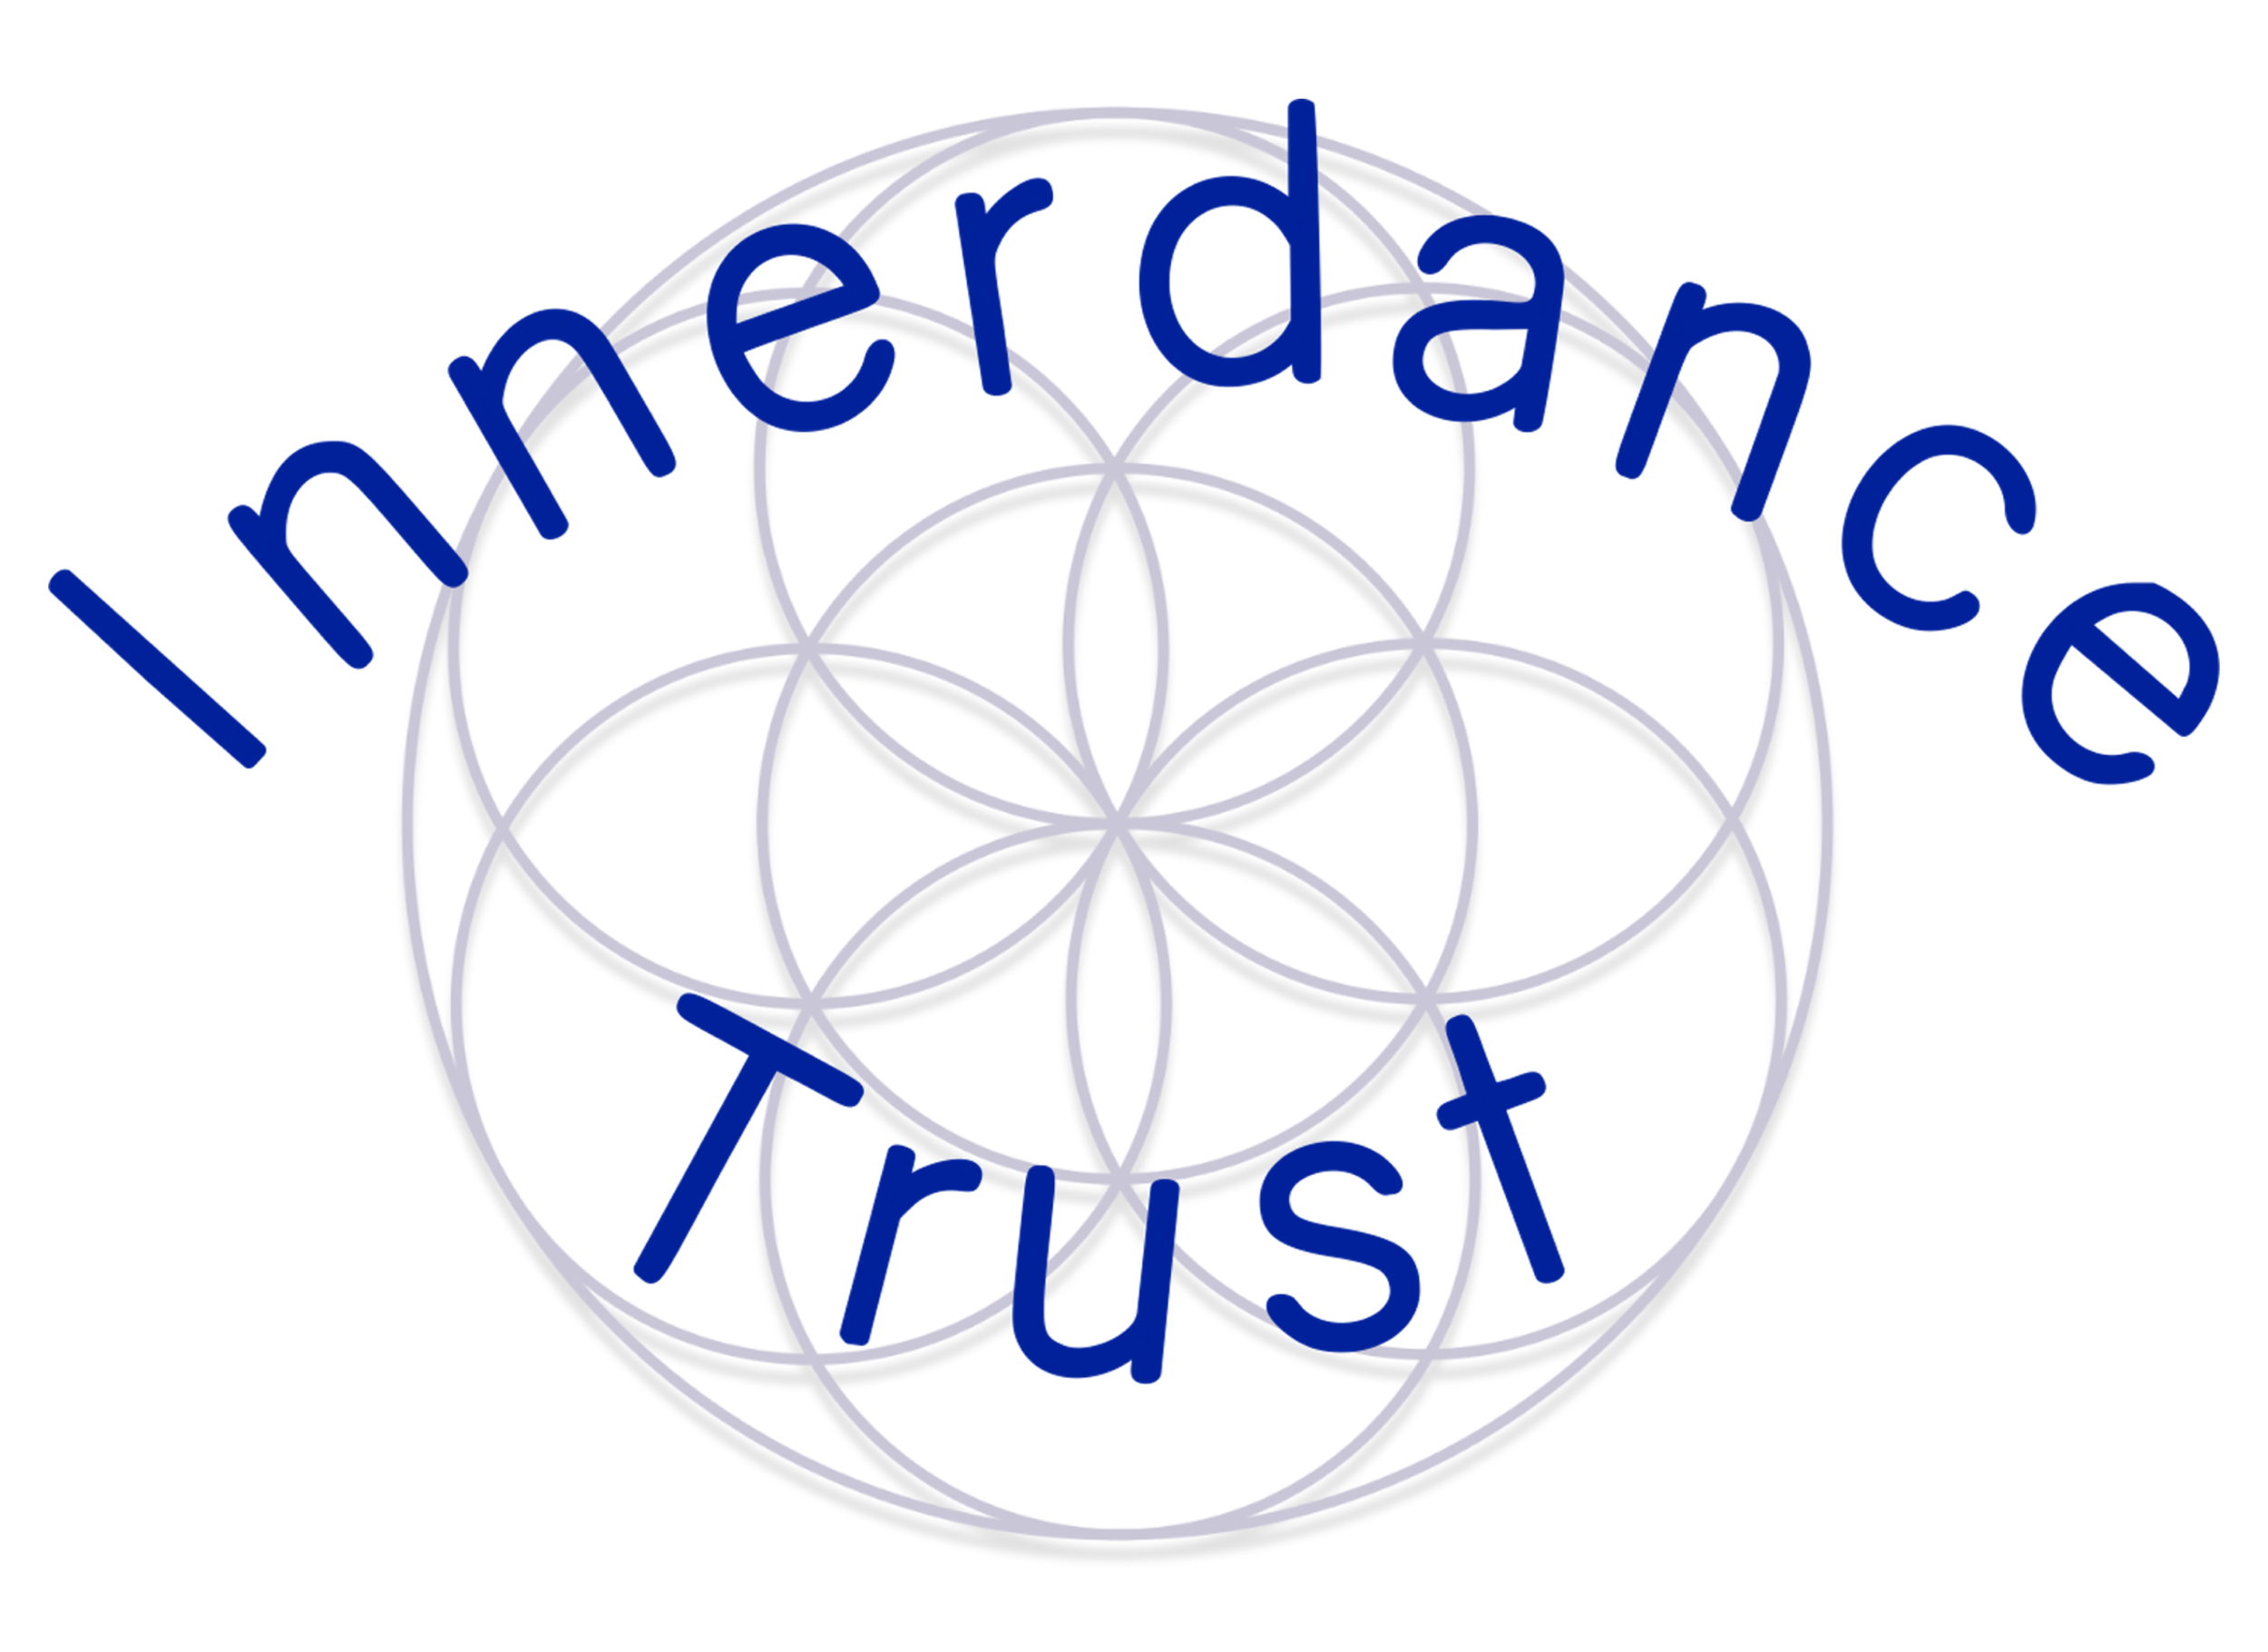 Innerdance Global